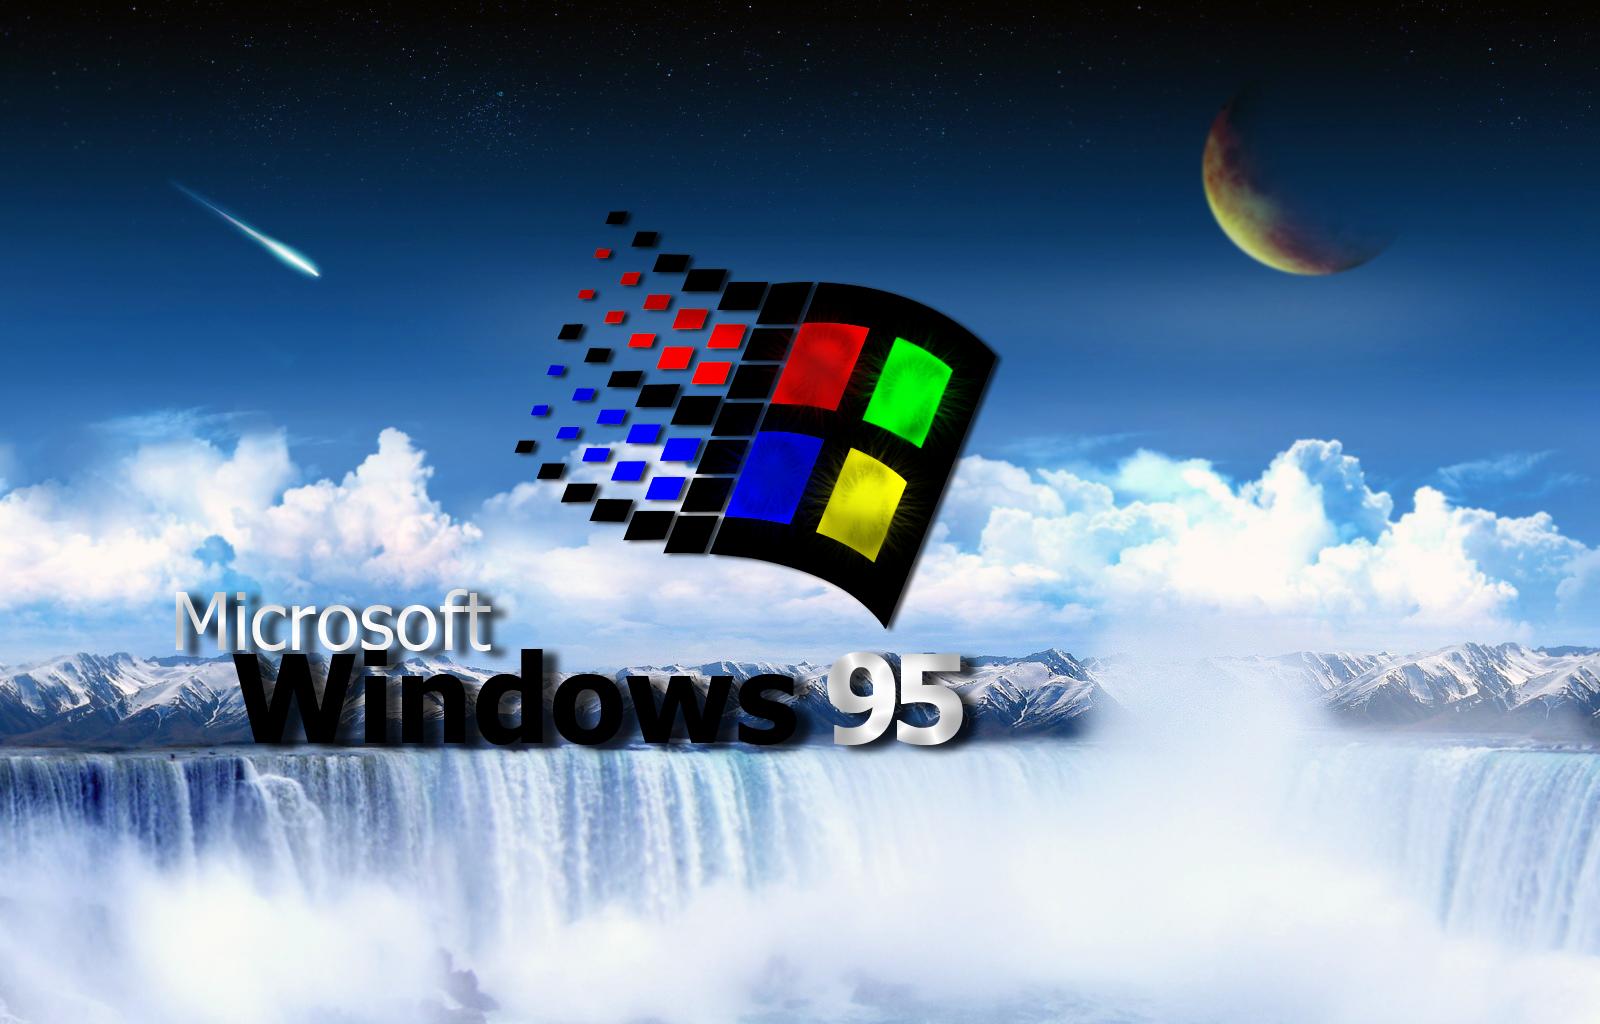 Windows 95 wallpaper wallpapersafari - Wallpaper 1600x1024 ...